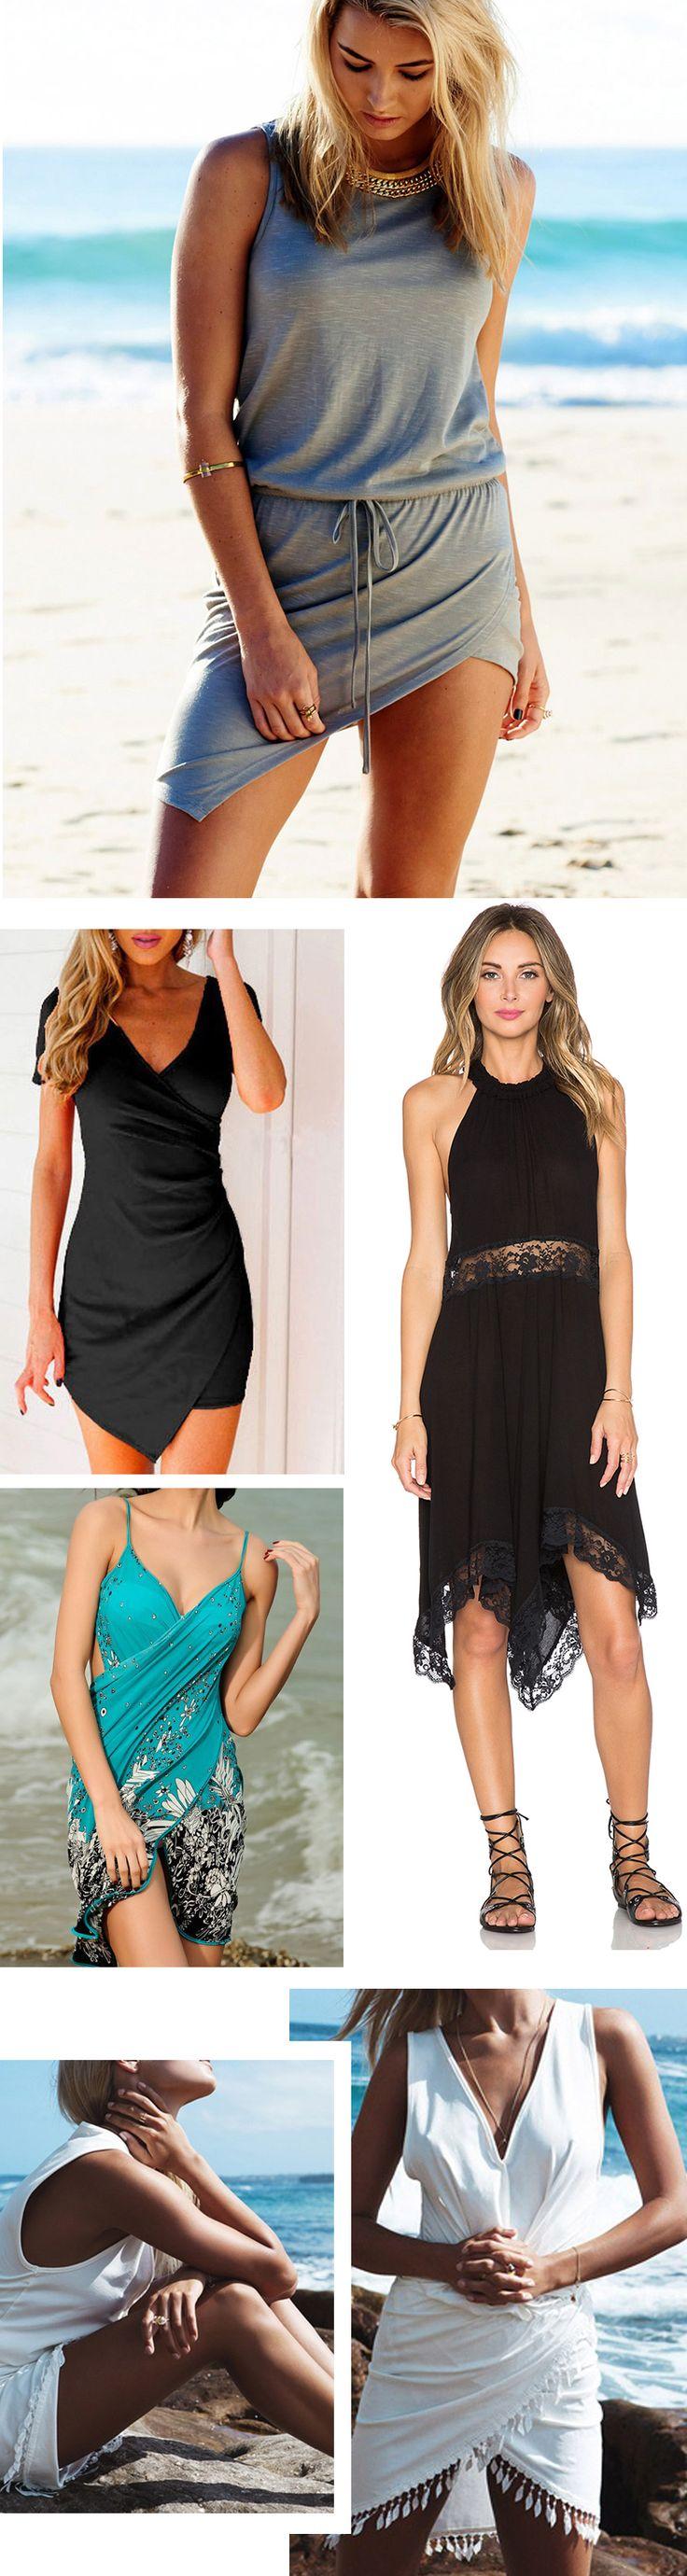 Stylish asymmetrical dress popular trends i just love it